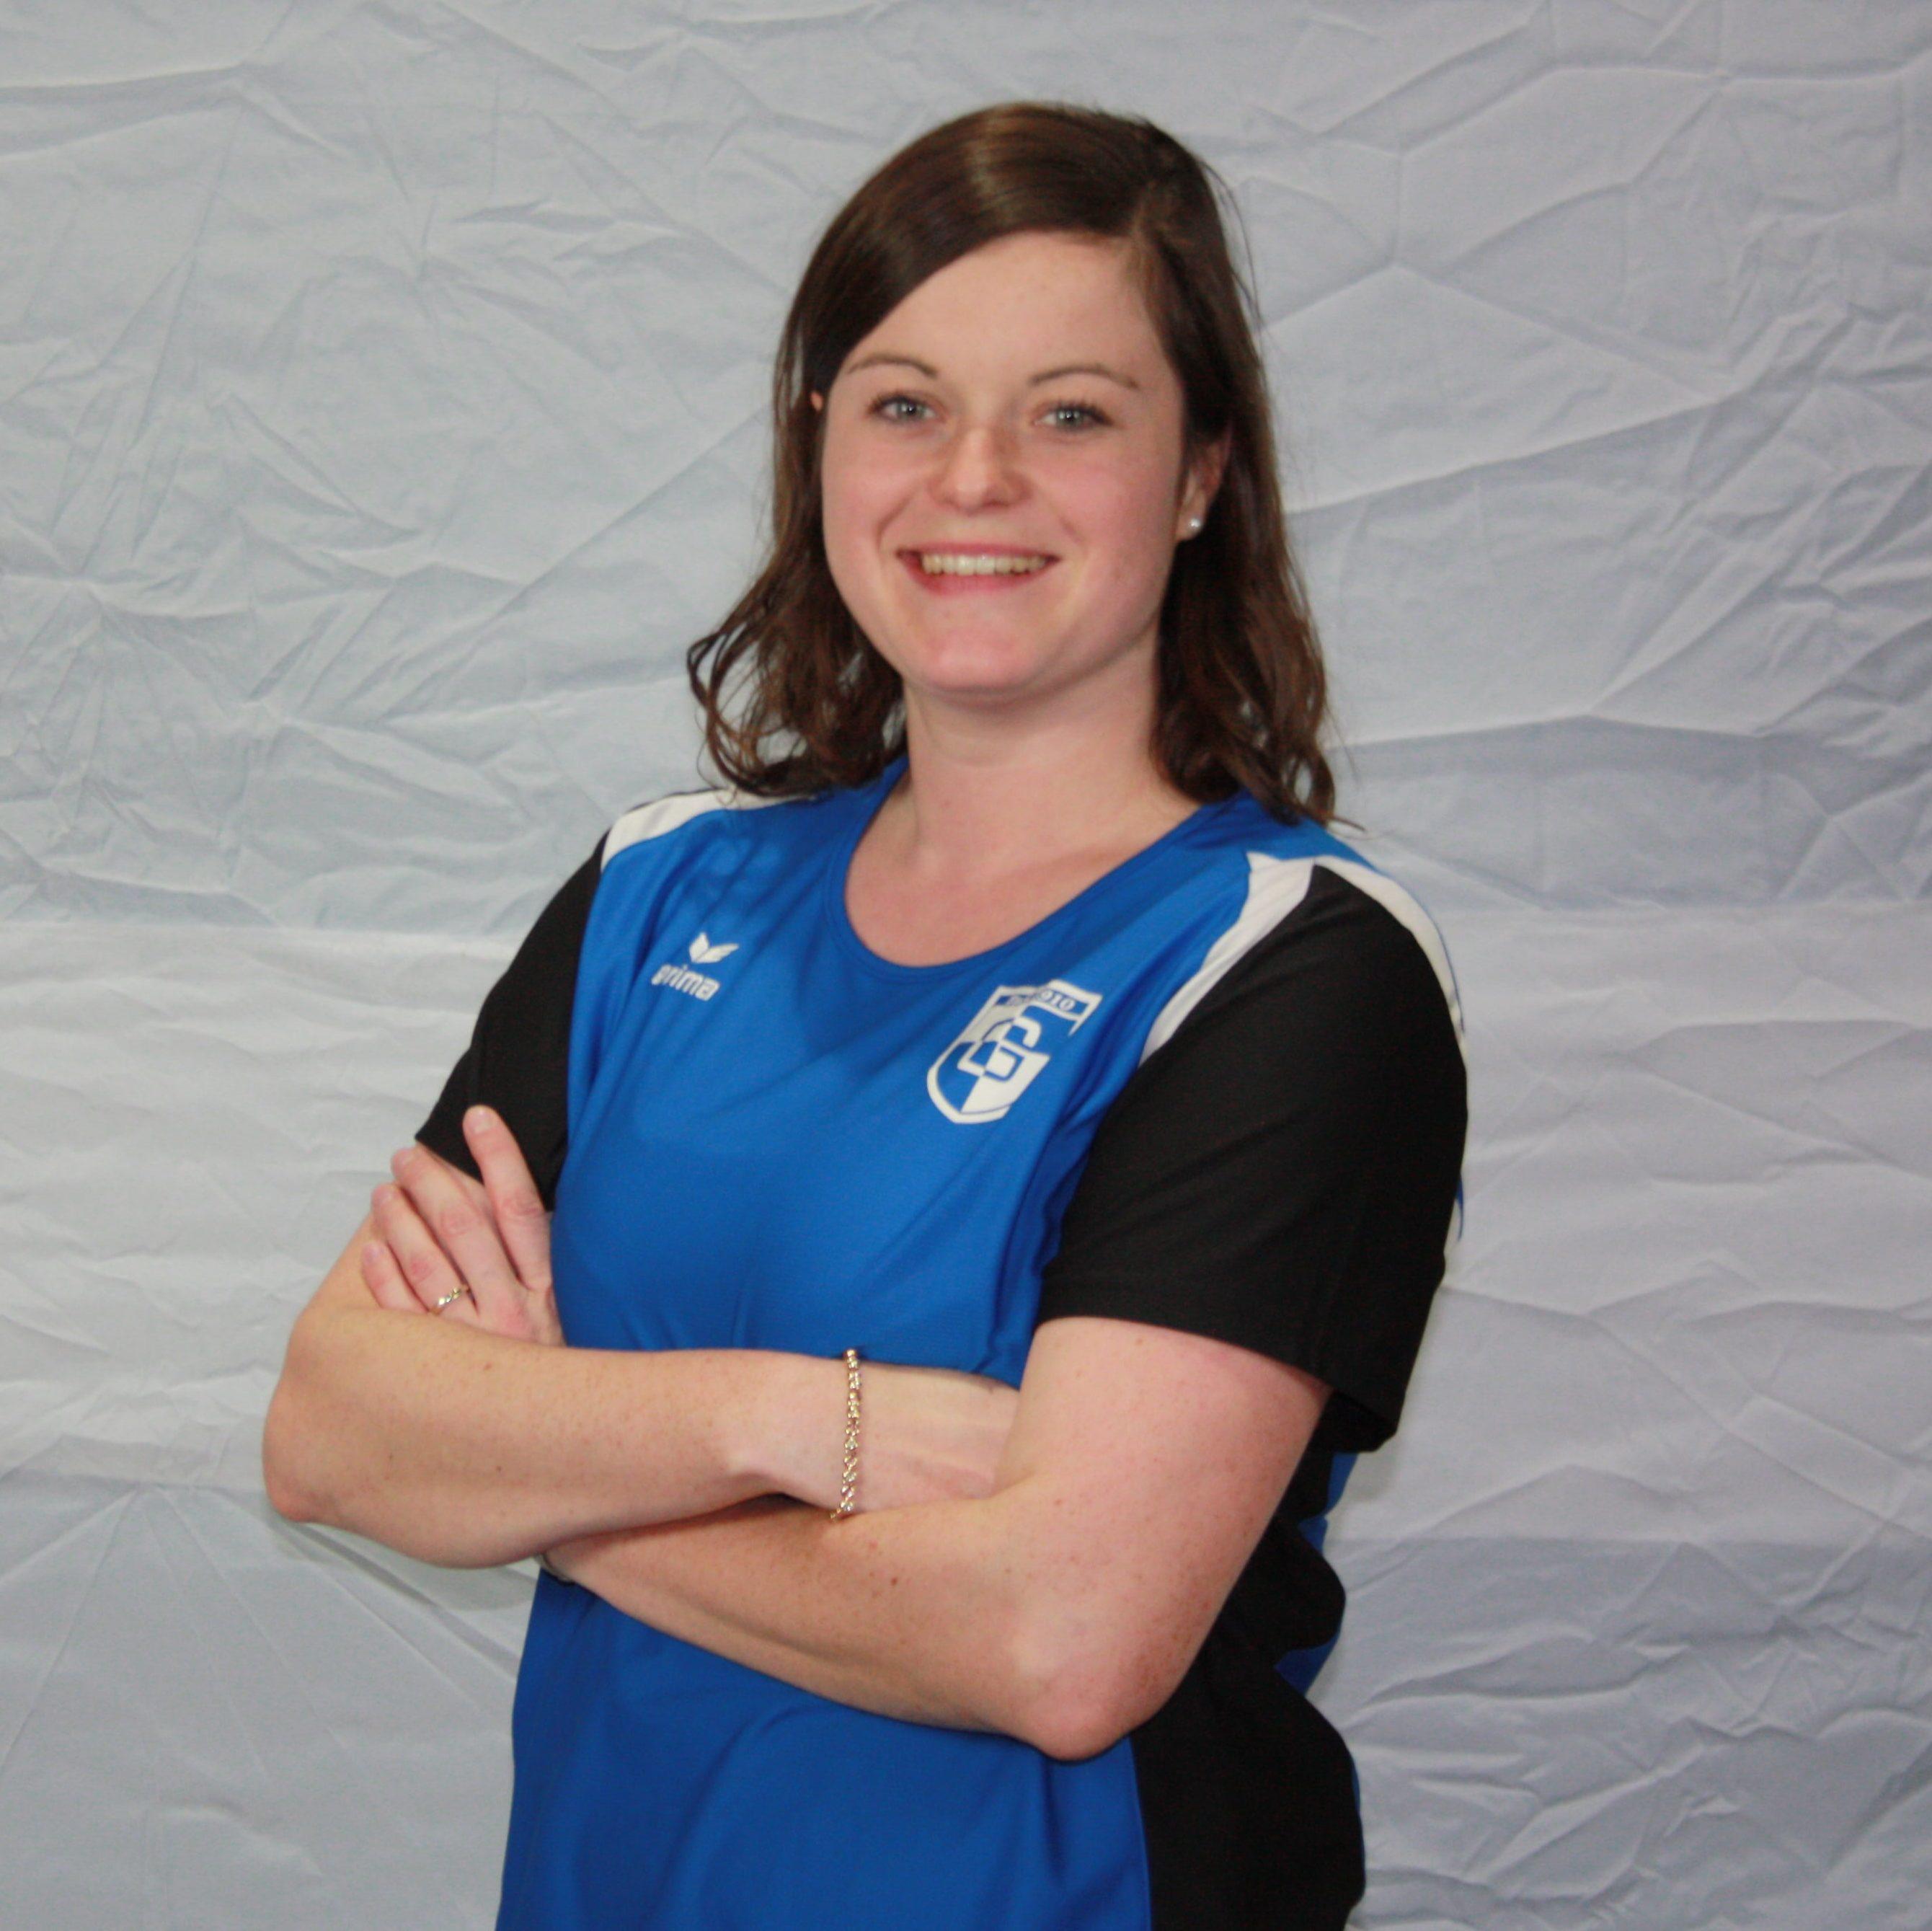 Vera Dapper TuS Germania Horstmar Leichtathletik Vorstand